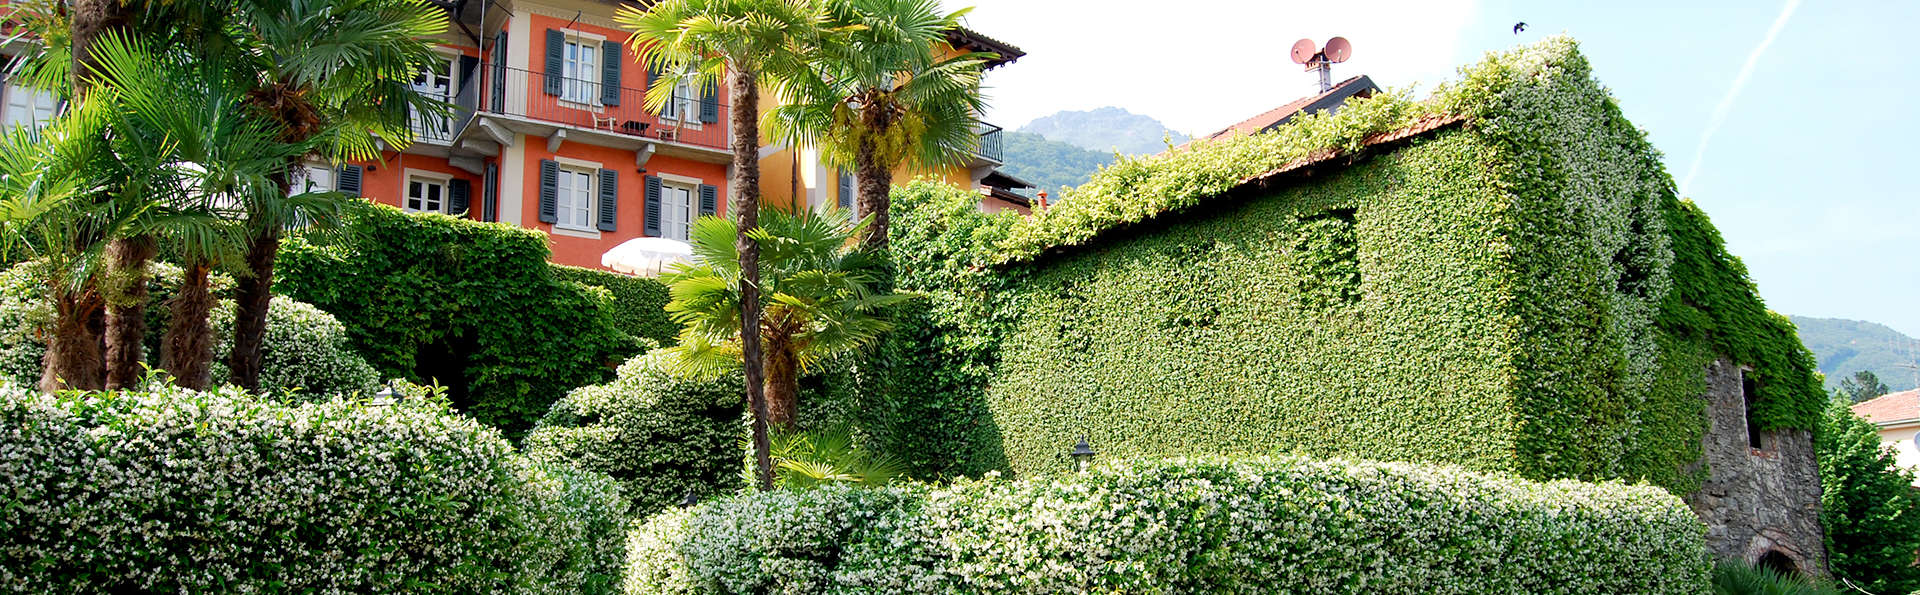 Villa Margherita, The Originals Relais (Relais du Silence) - Edit_front.jpg